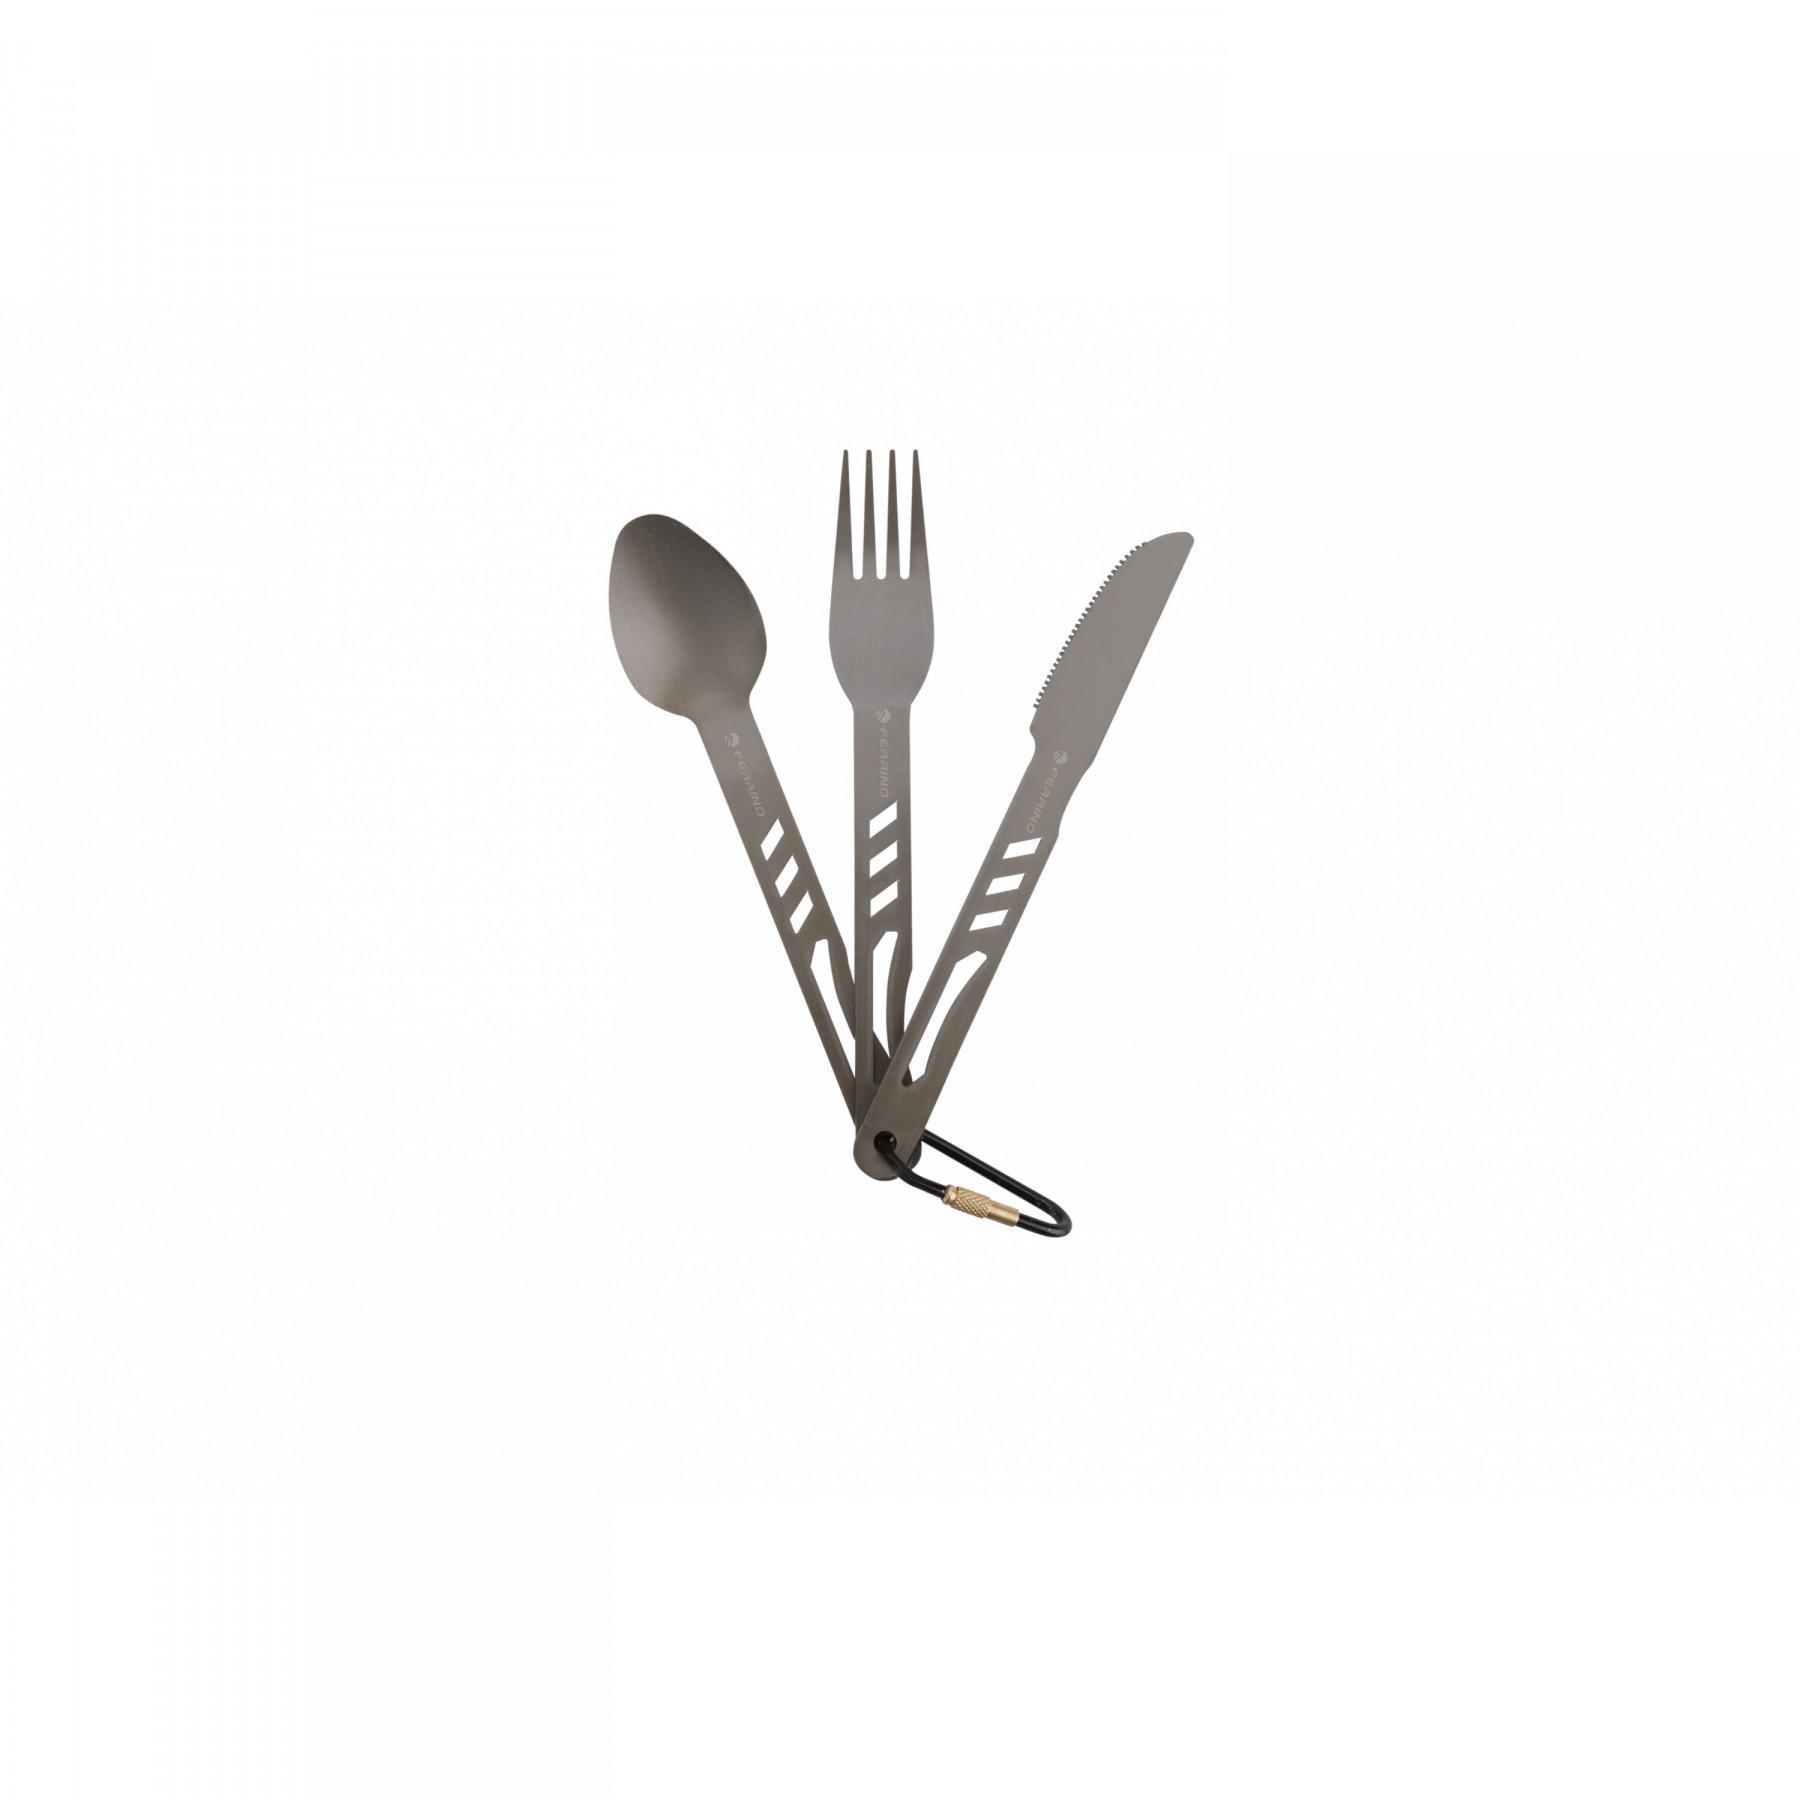 Aluminium cutlery set Ferrino